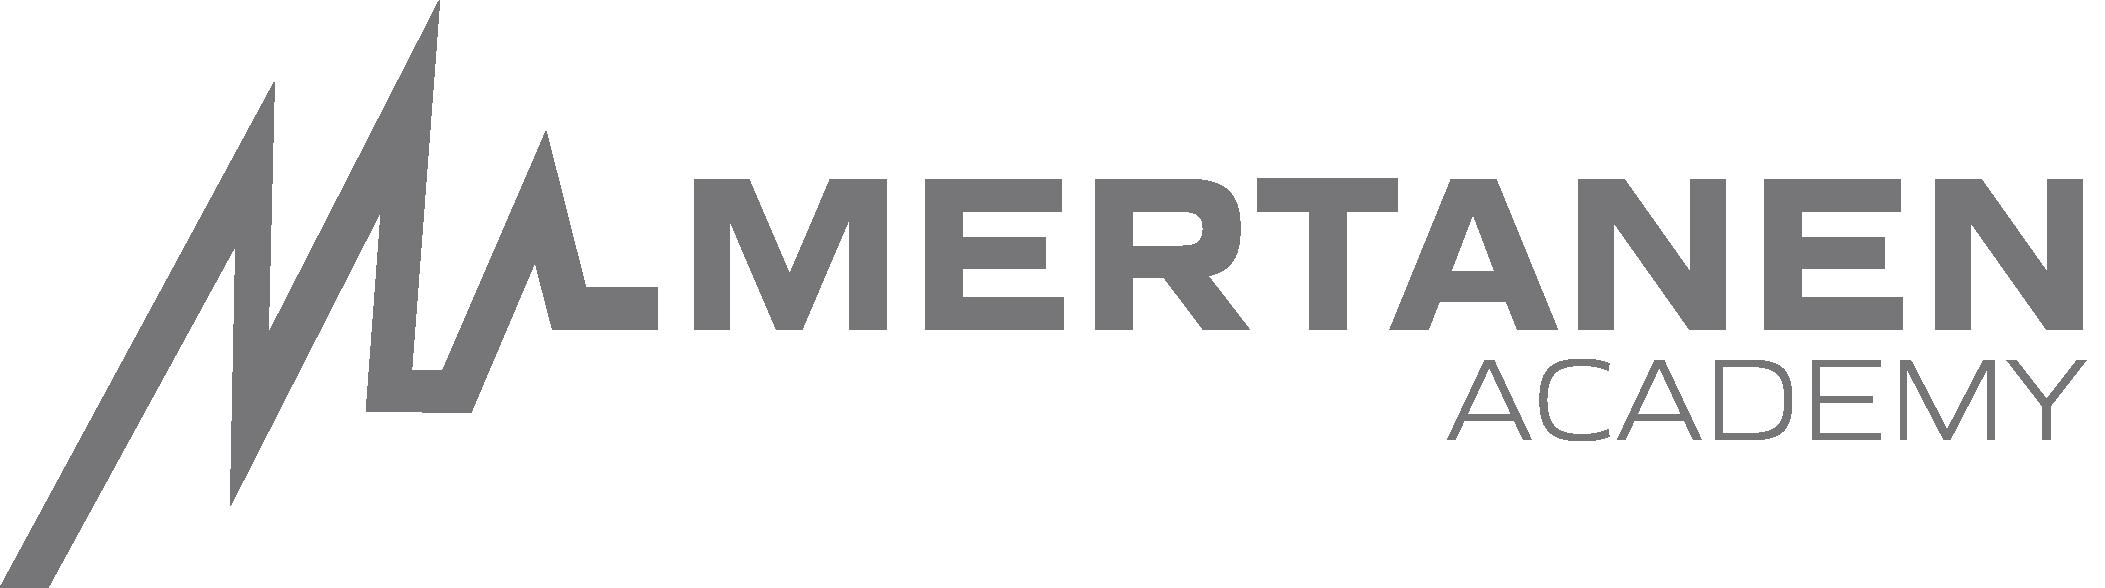 mertanen_academy_logo_-harmaa-rgb-png.png (29 KB)